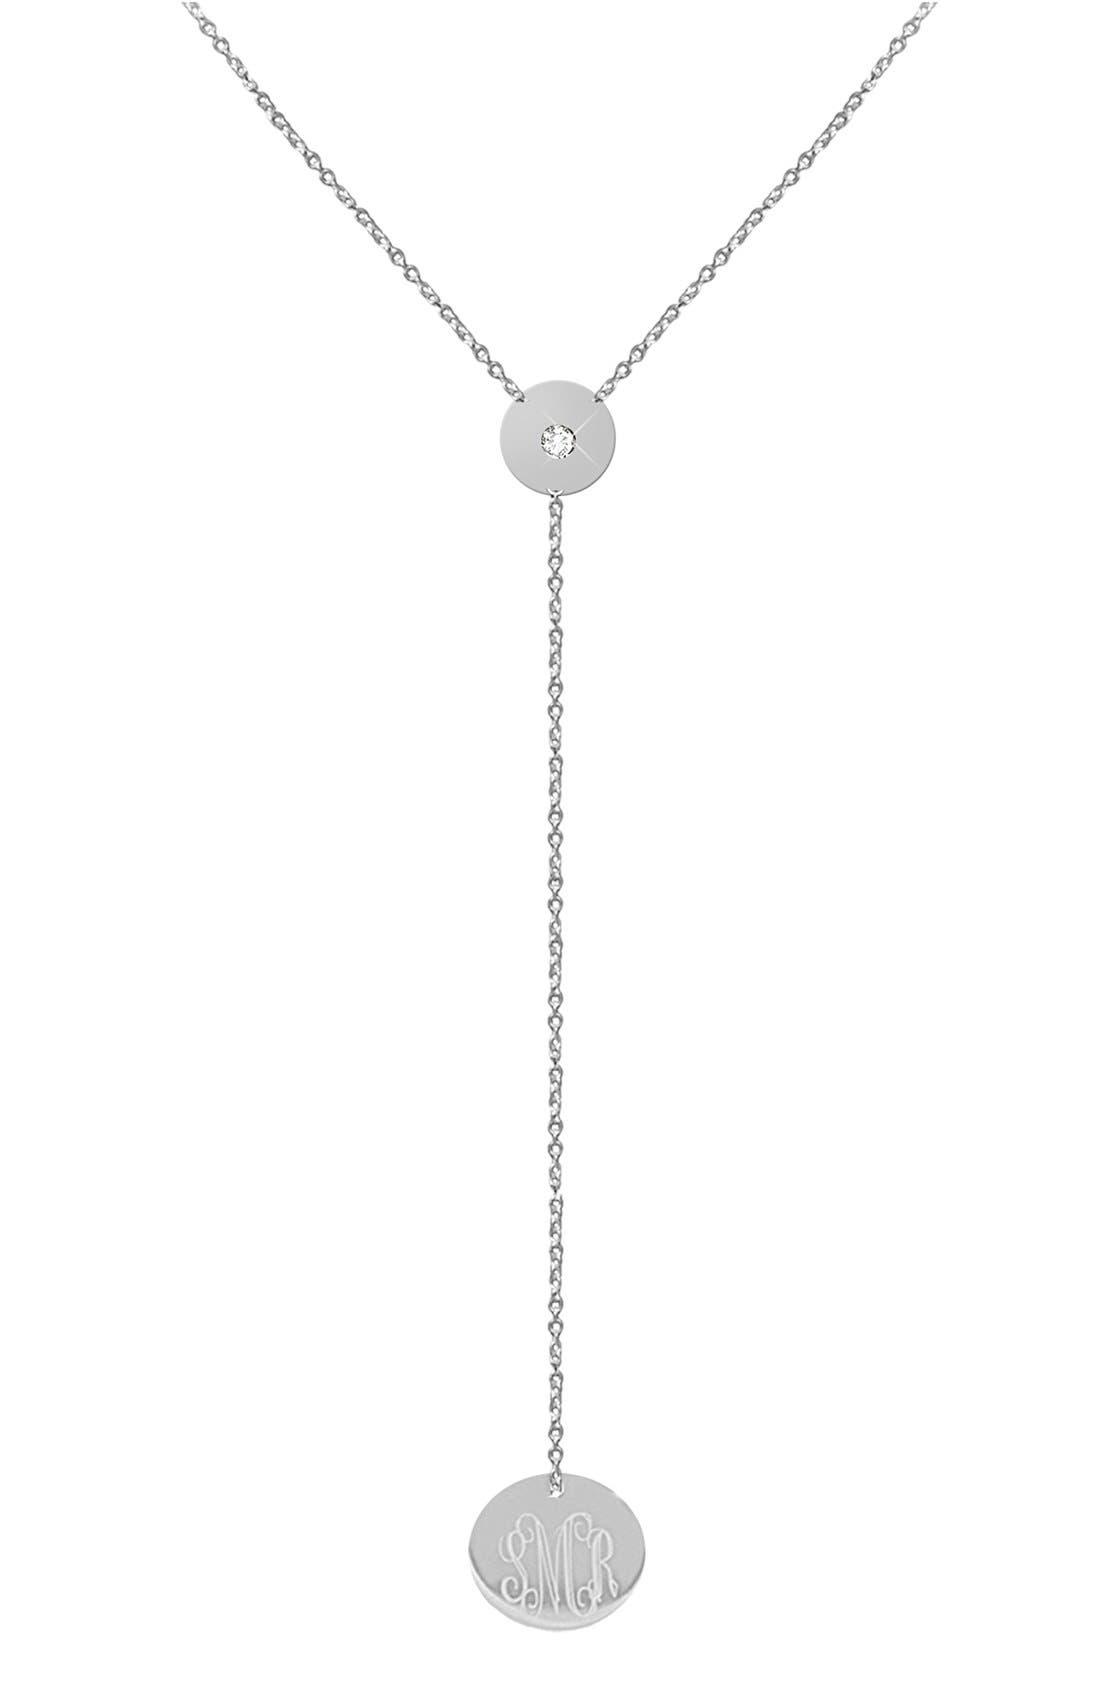 Jane Basch Designs Diamond & Personalized Monogram Y-Necklace (Nordstrom Online Exclusive)